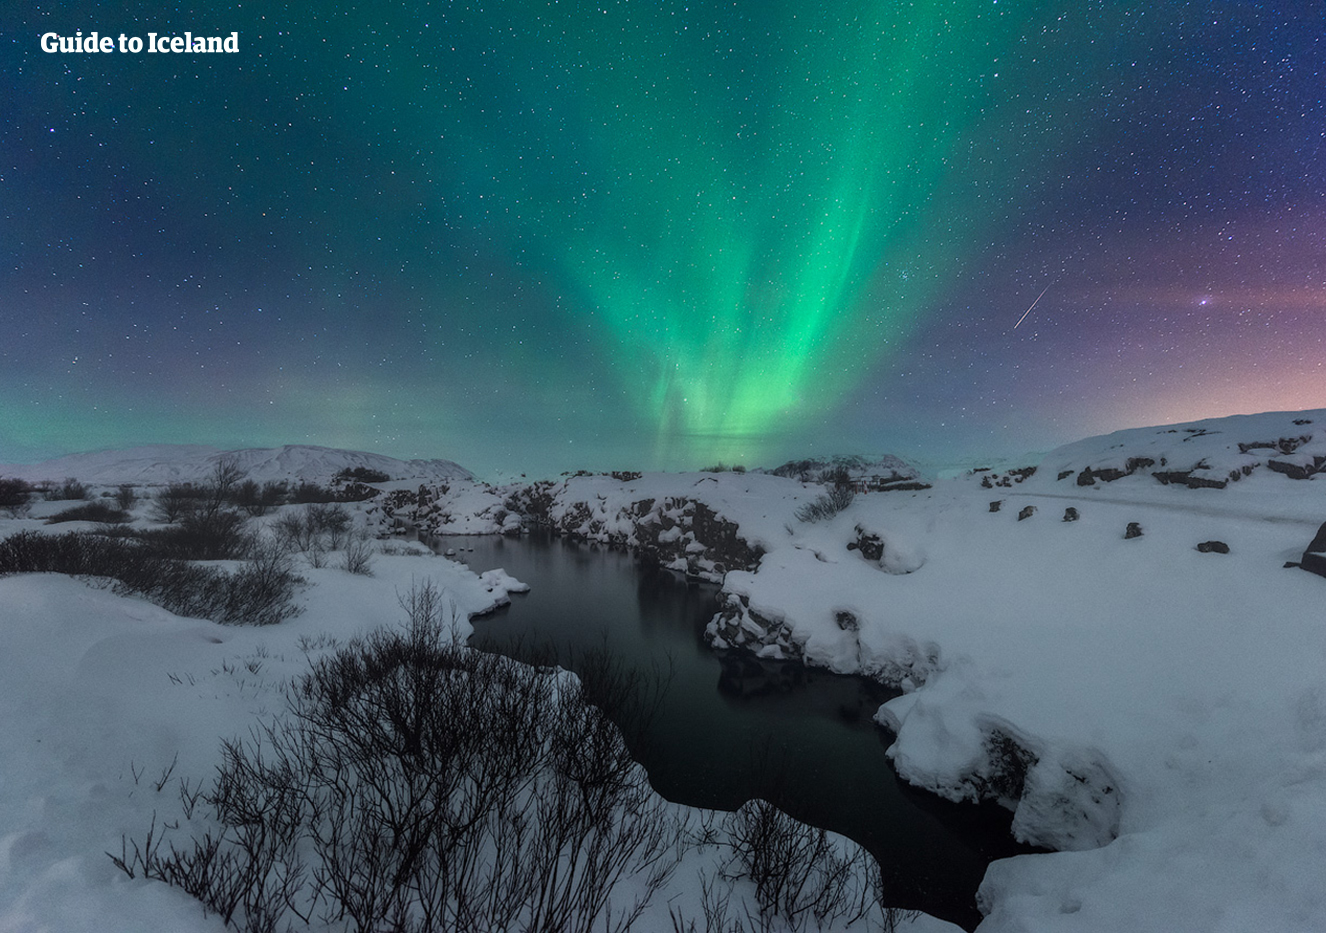 32m 아래로 물을 쏟아붓는 서부 아이슬란드의 상징, 굴포스 폭포.